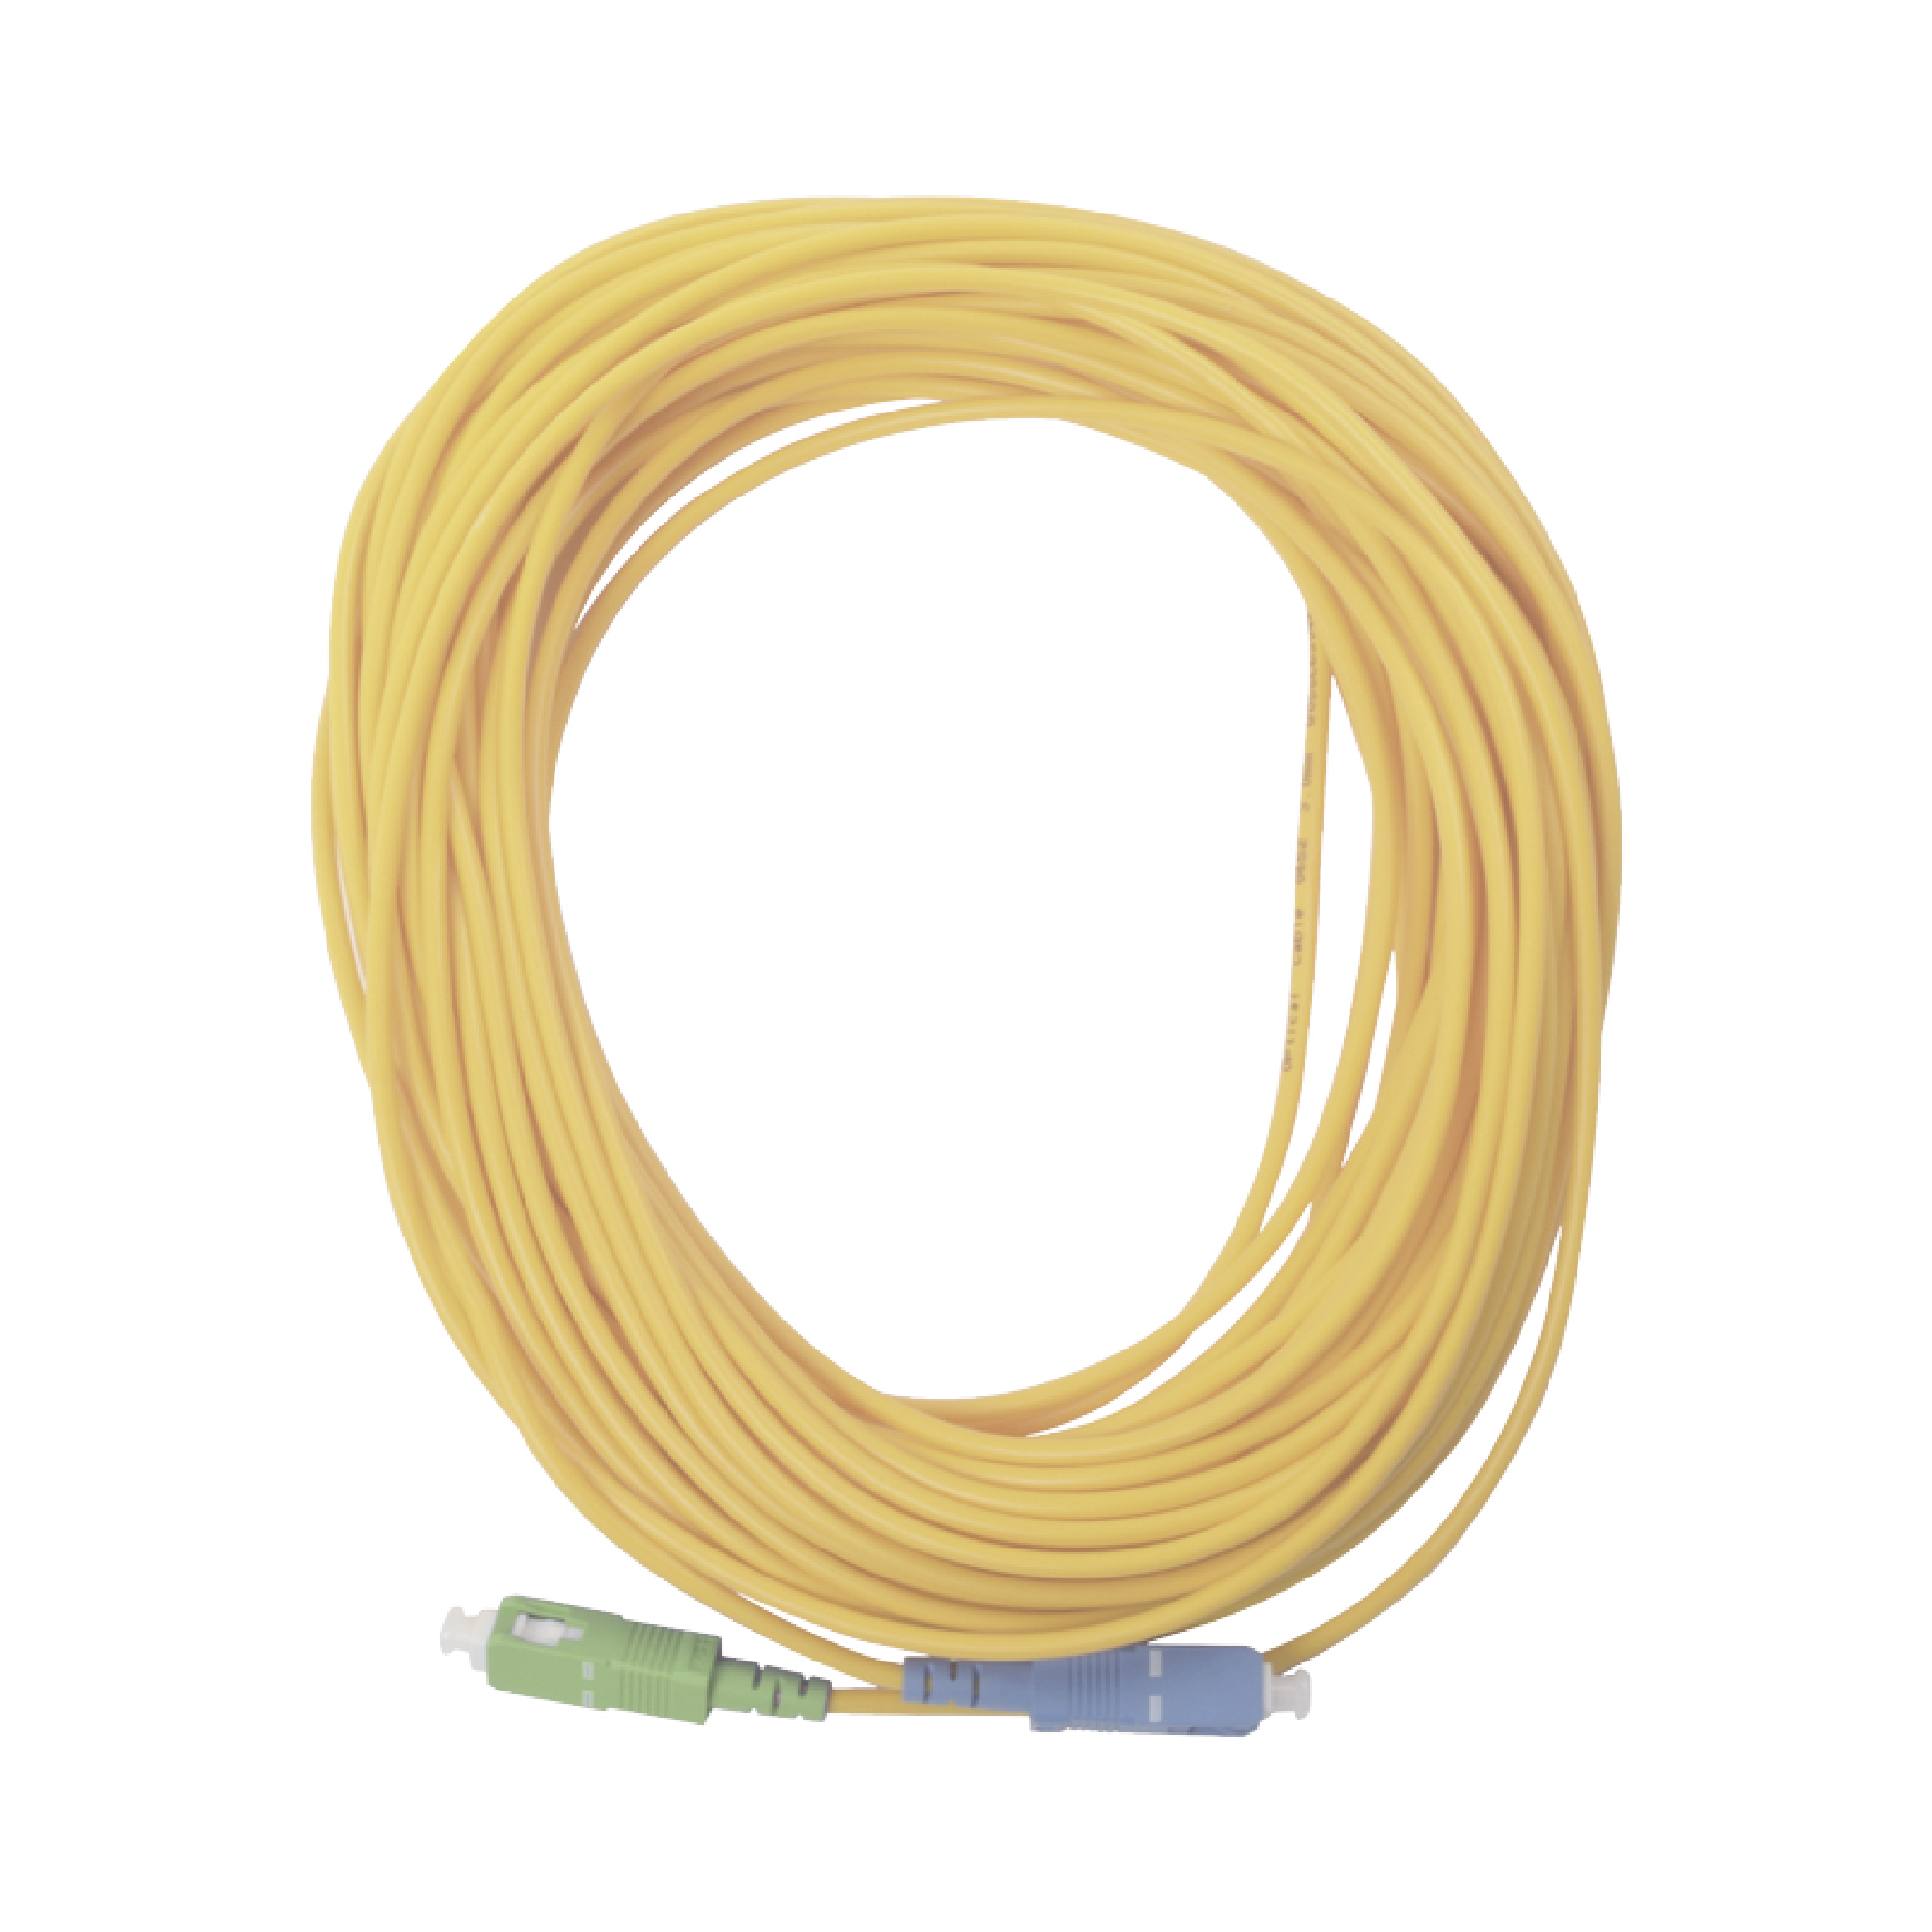 Jumper de Fibra óptica Simplex, Monomodo, con Conectores SC/UPC-SC/APC, de 20 Metros